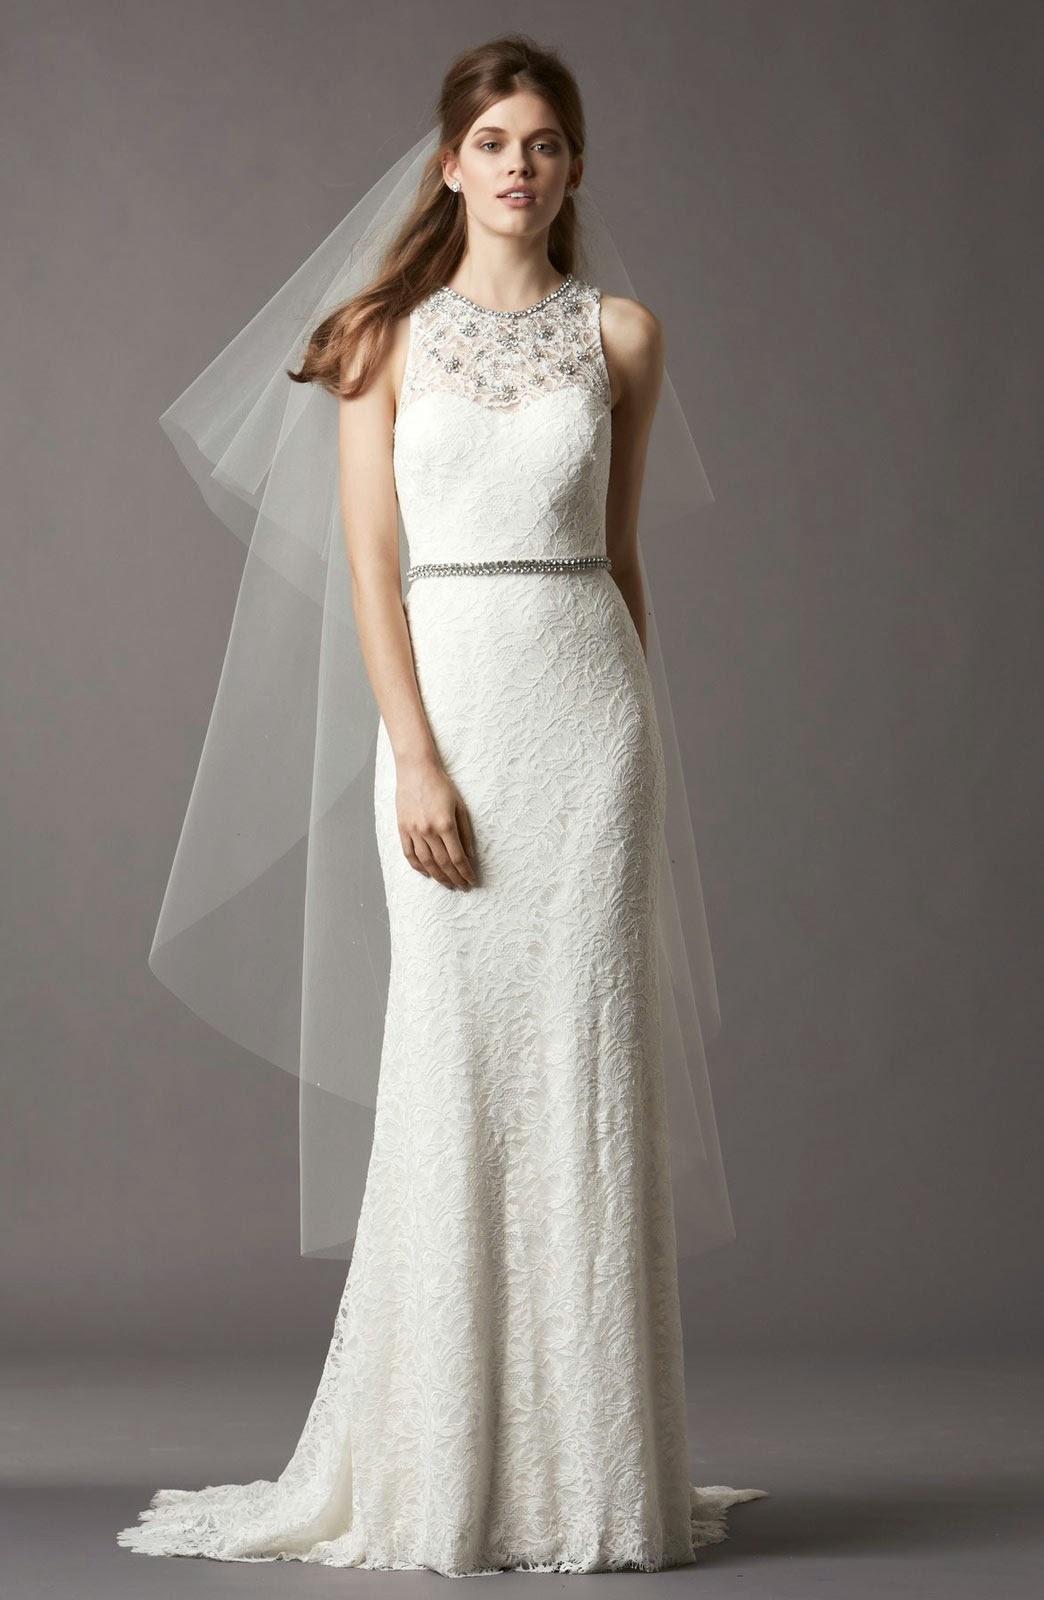 Simple Modern White Wedding Dresses UK (England) Photos HD Design Ideas